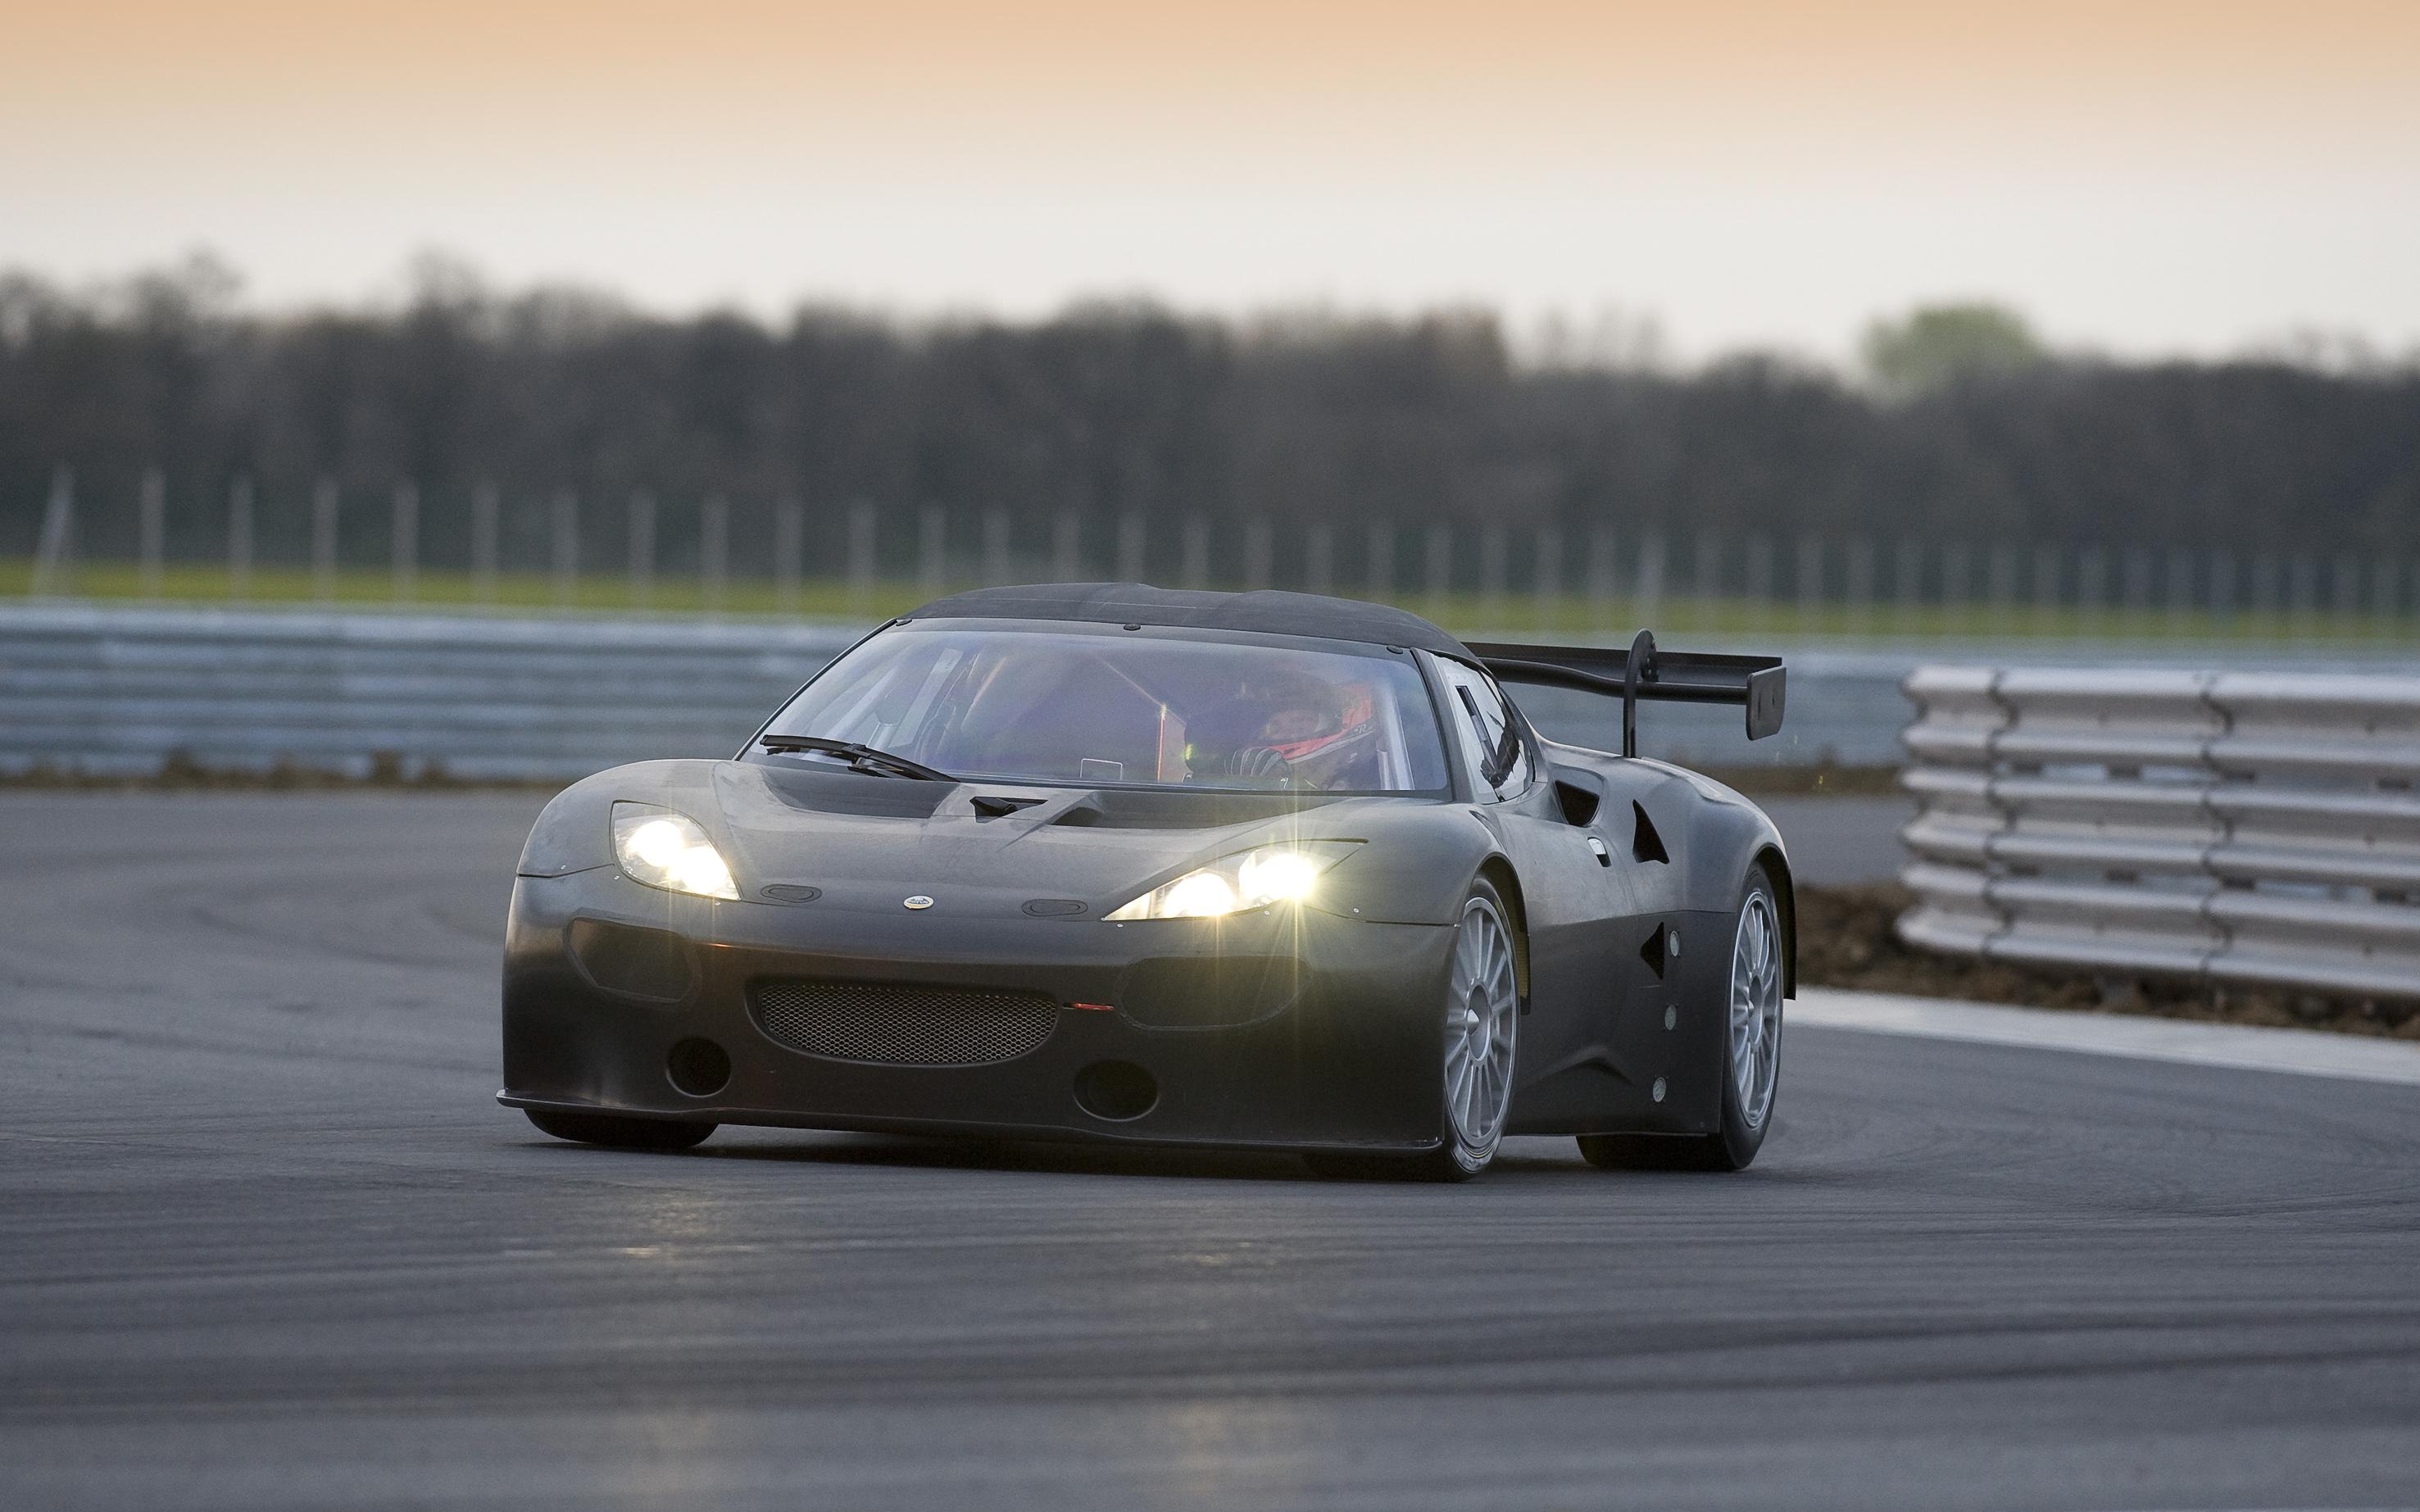 https://get.wallhere.com/photo/car-vehicle-sports-car-2013-coupe-performance-car-Lotus-netcarshow-netcar-car-images-car-photo-Evora-GTE-race-car-supercar-land-vehicle-automotive-design-race-car-automobile-make-luxury-vehicle-430092.jpg